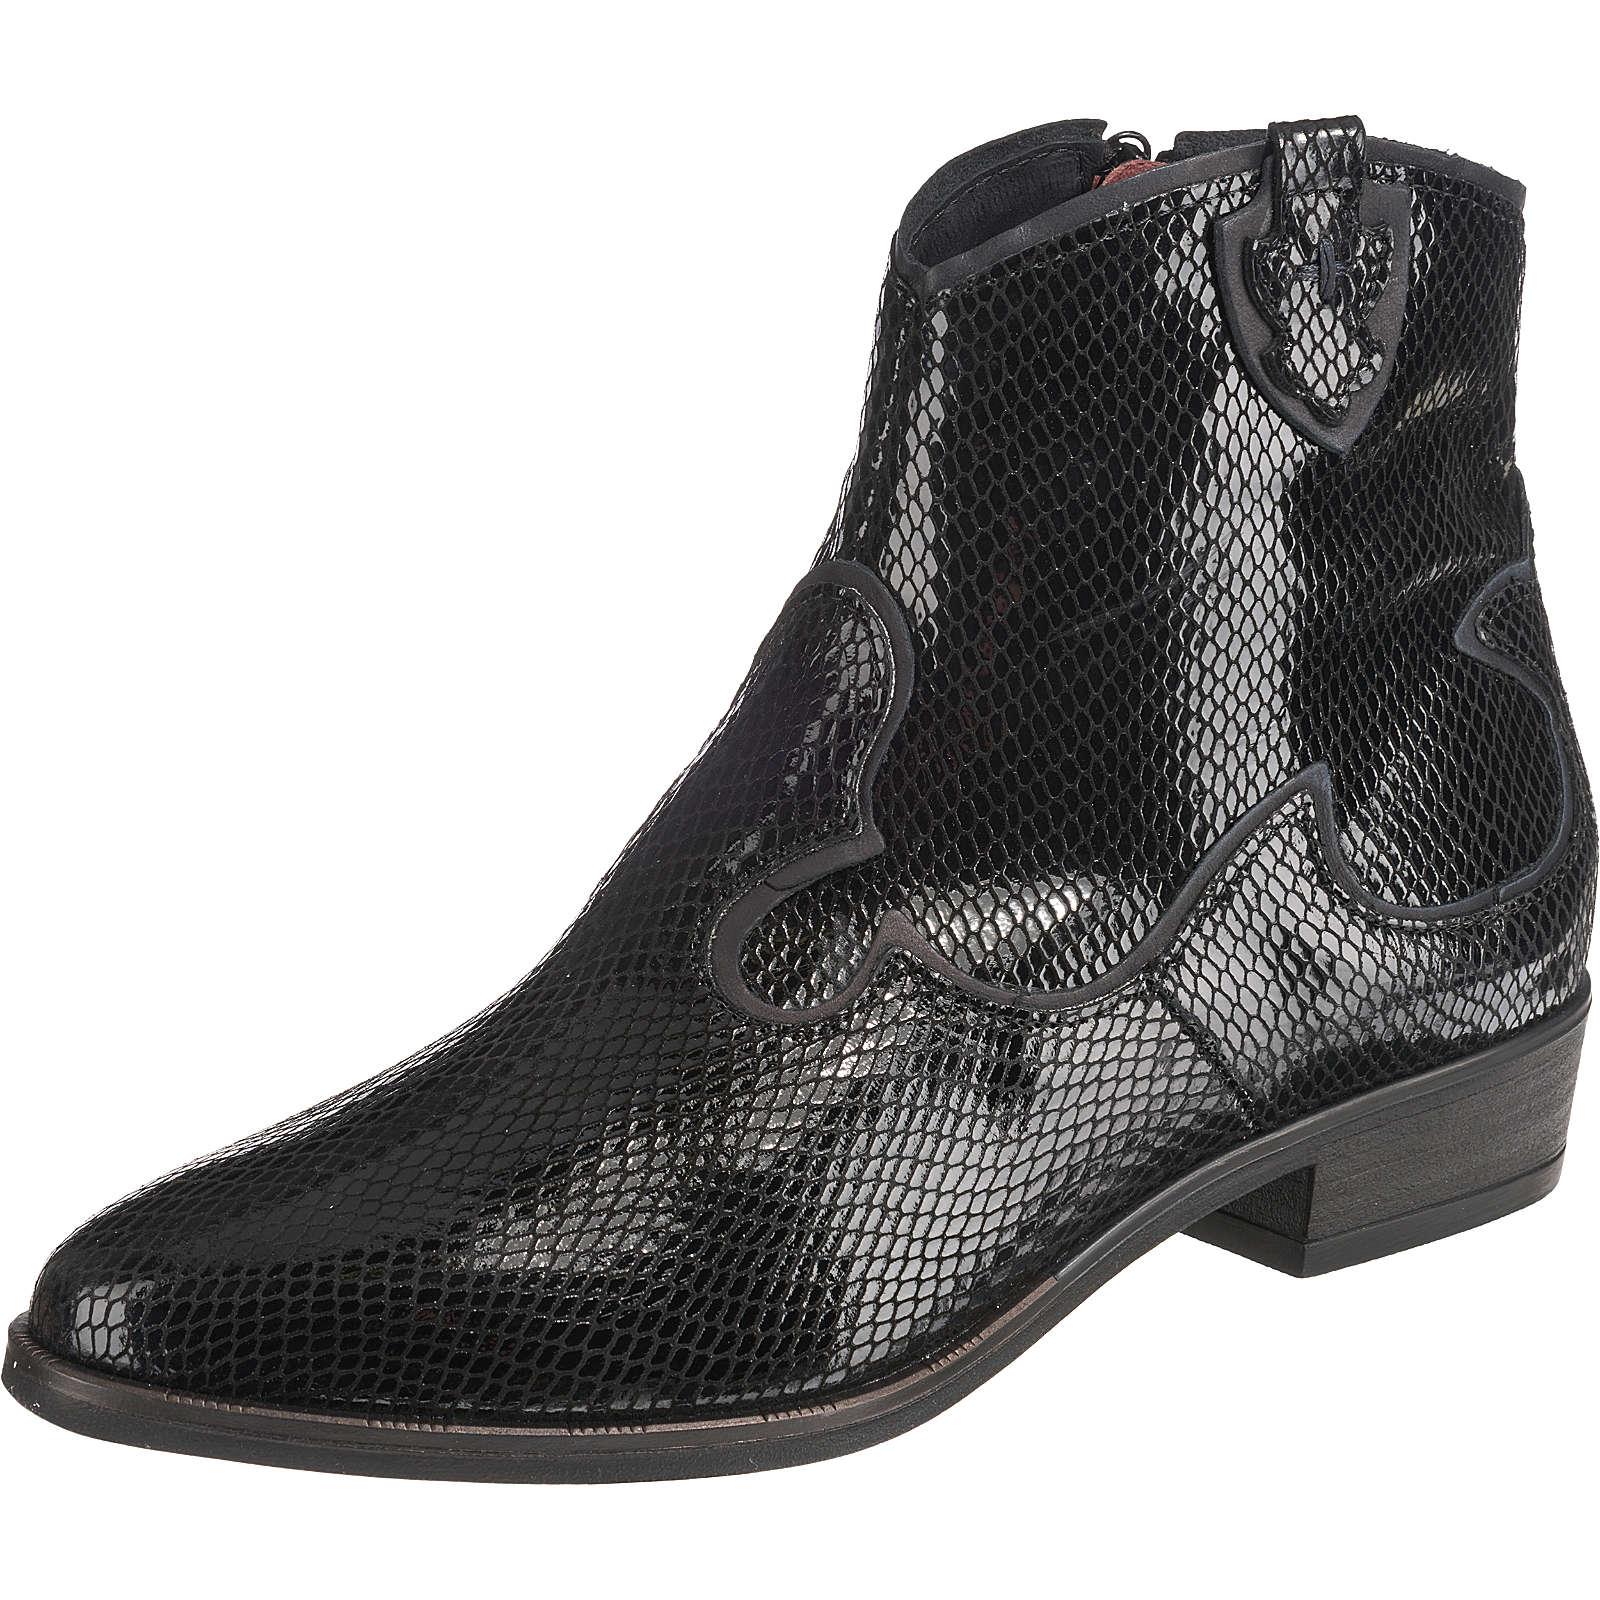 MJUS Biker Boots schwarz Damen Gr. 40